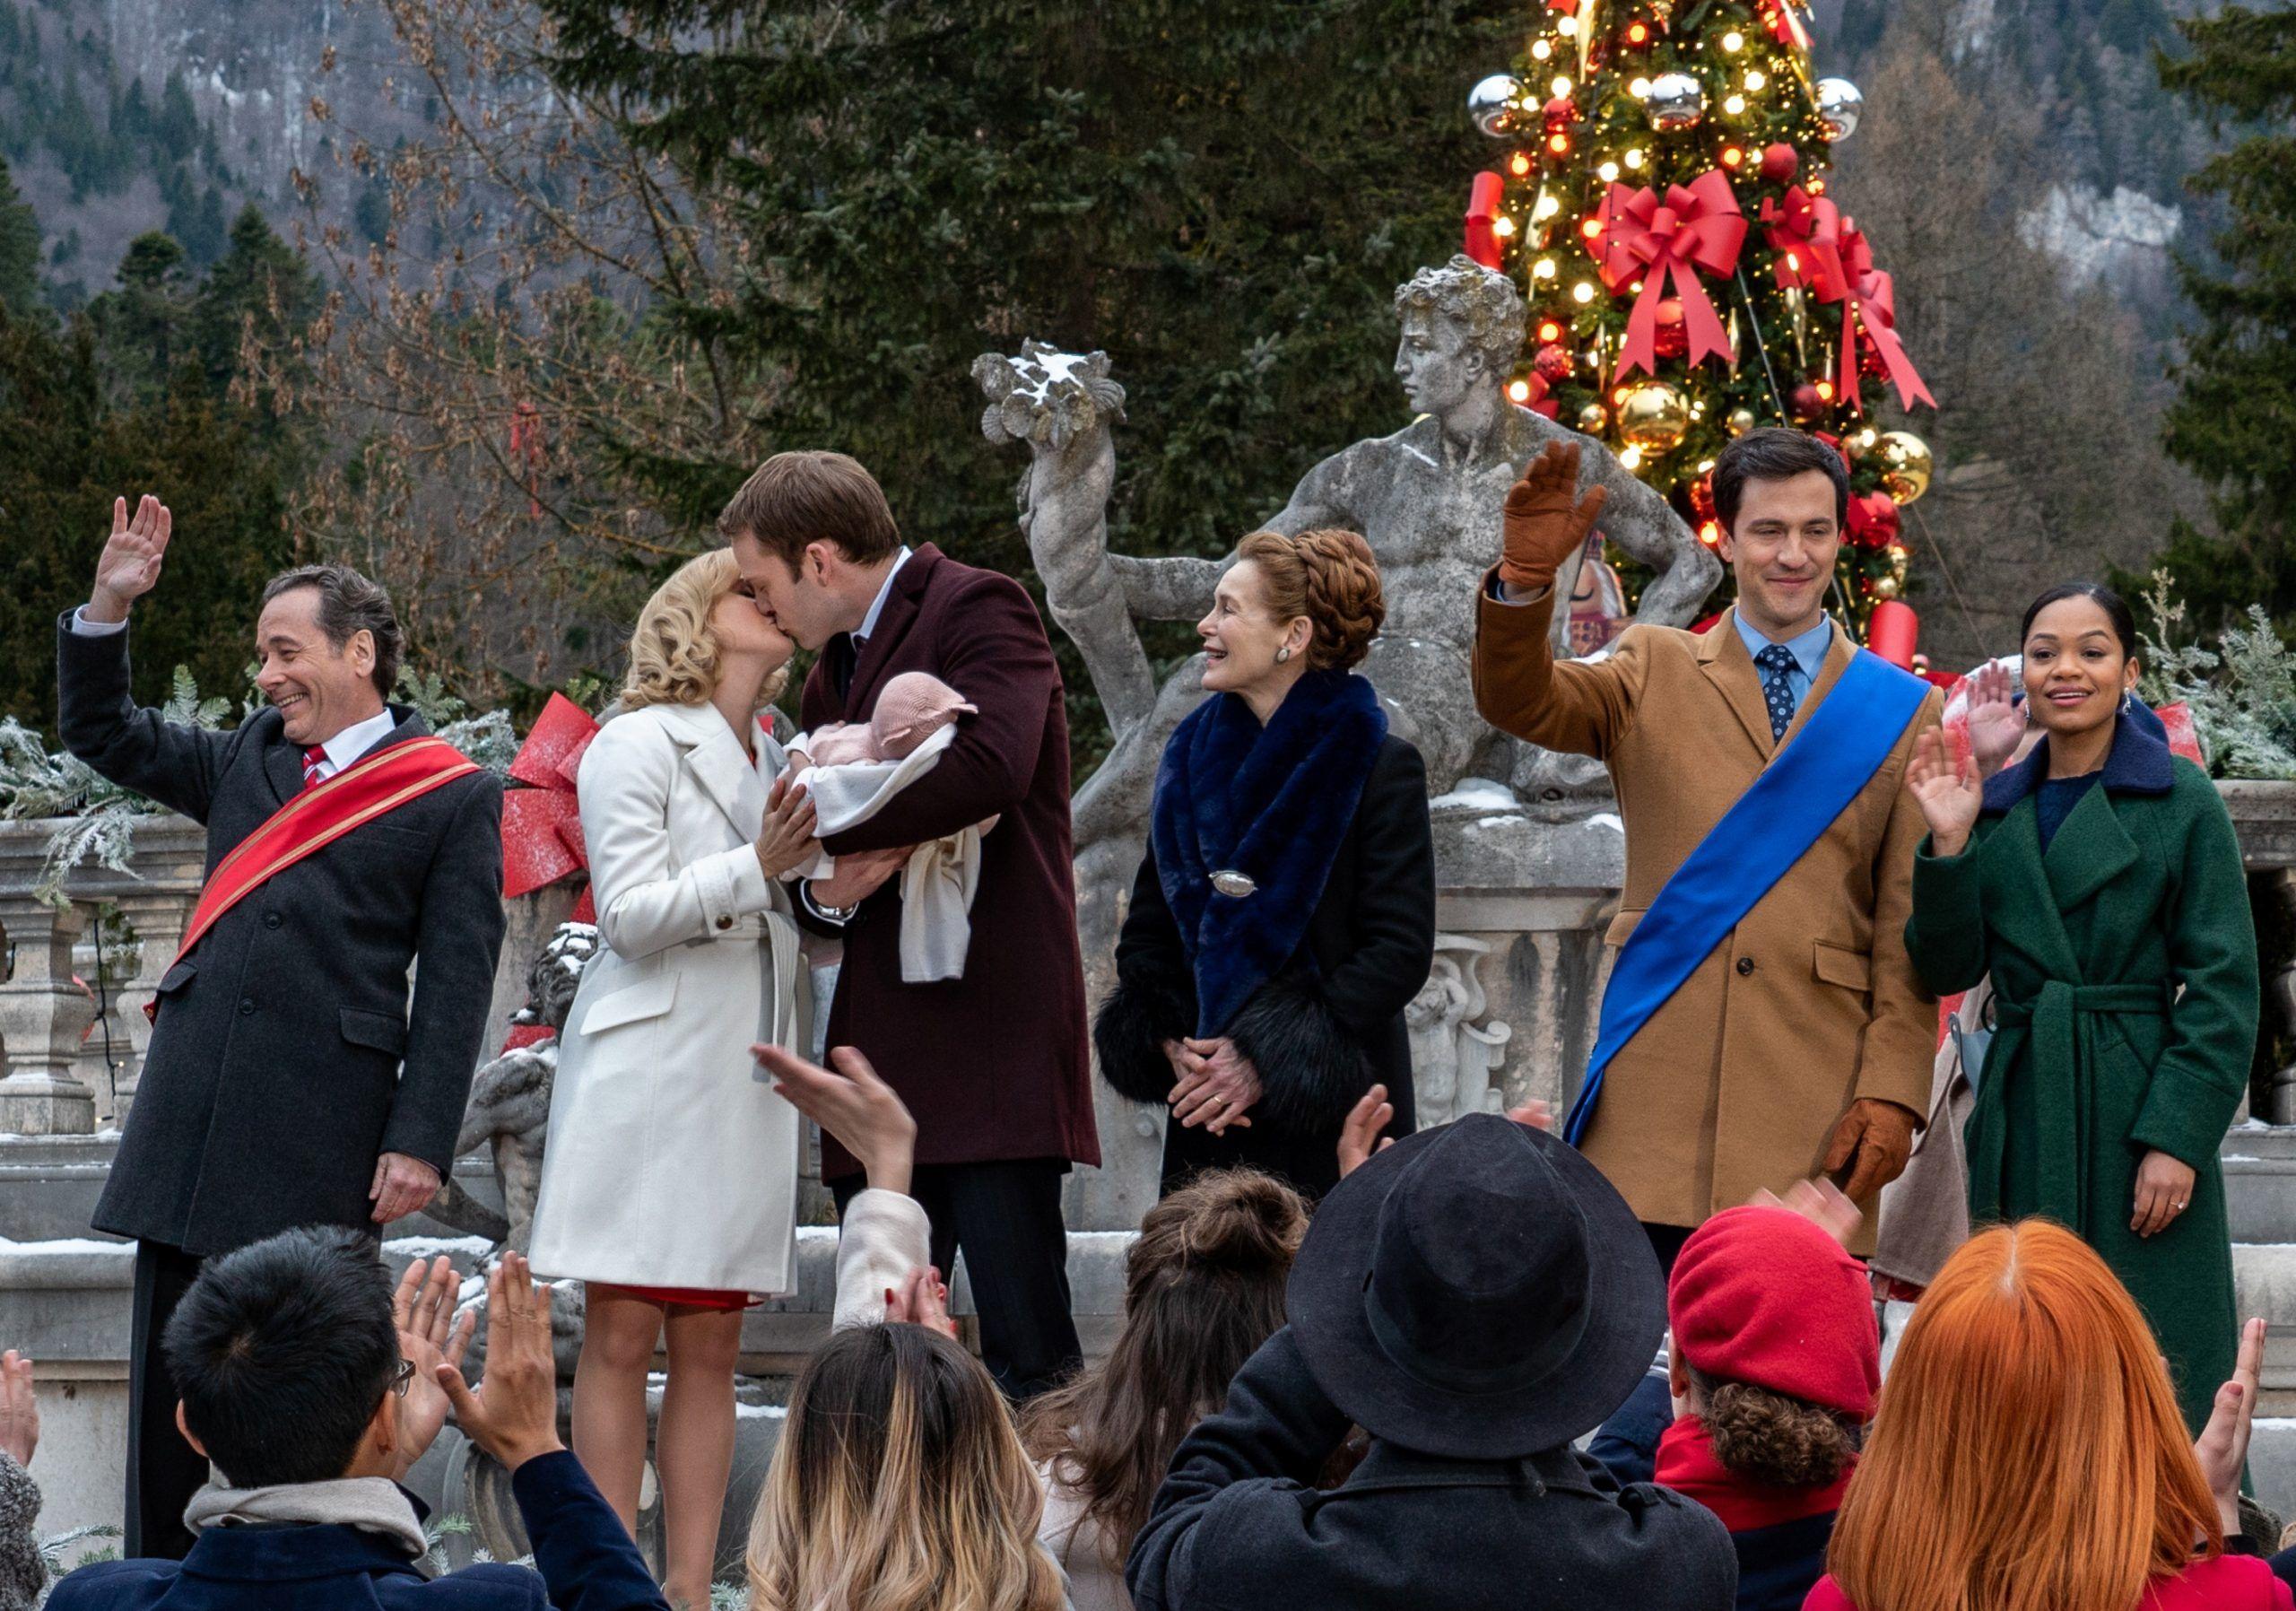 A Christmas Prince 3 Stars Rose McIver & Ben Lamb on the Netflix Franchise | Collider